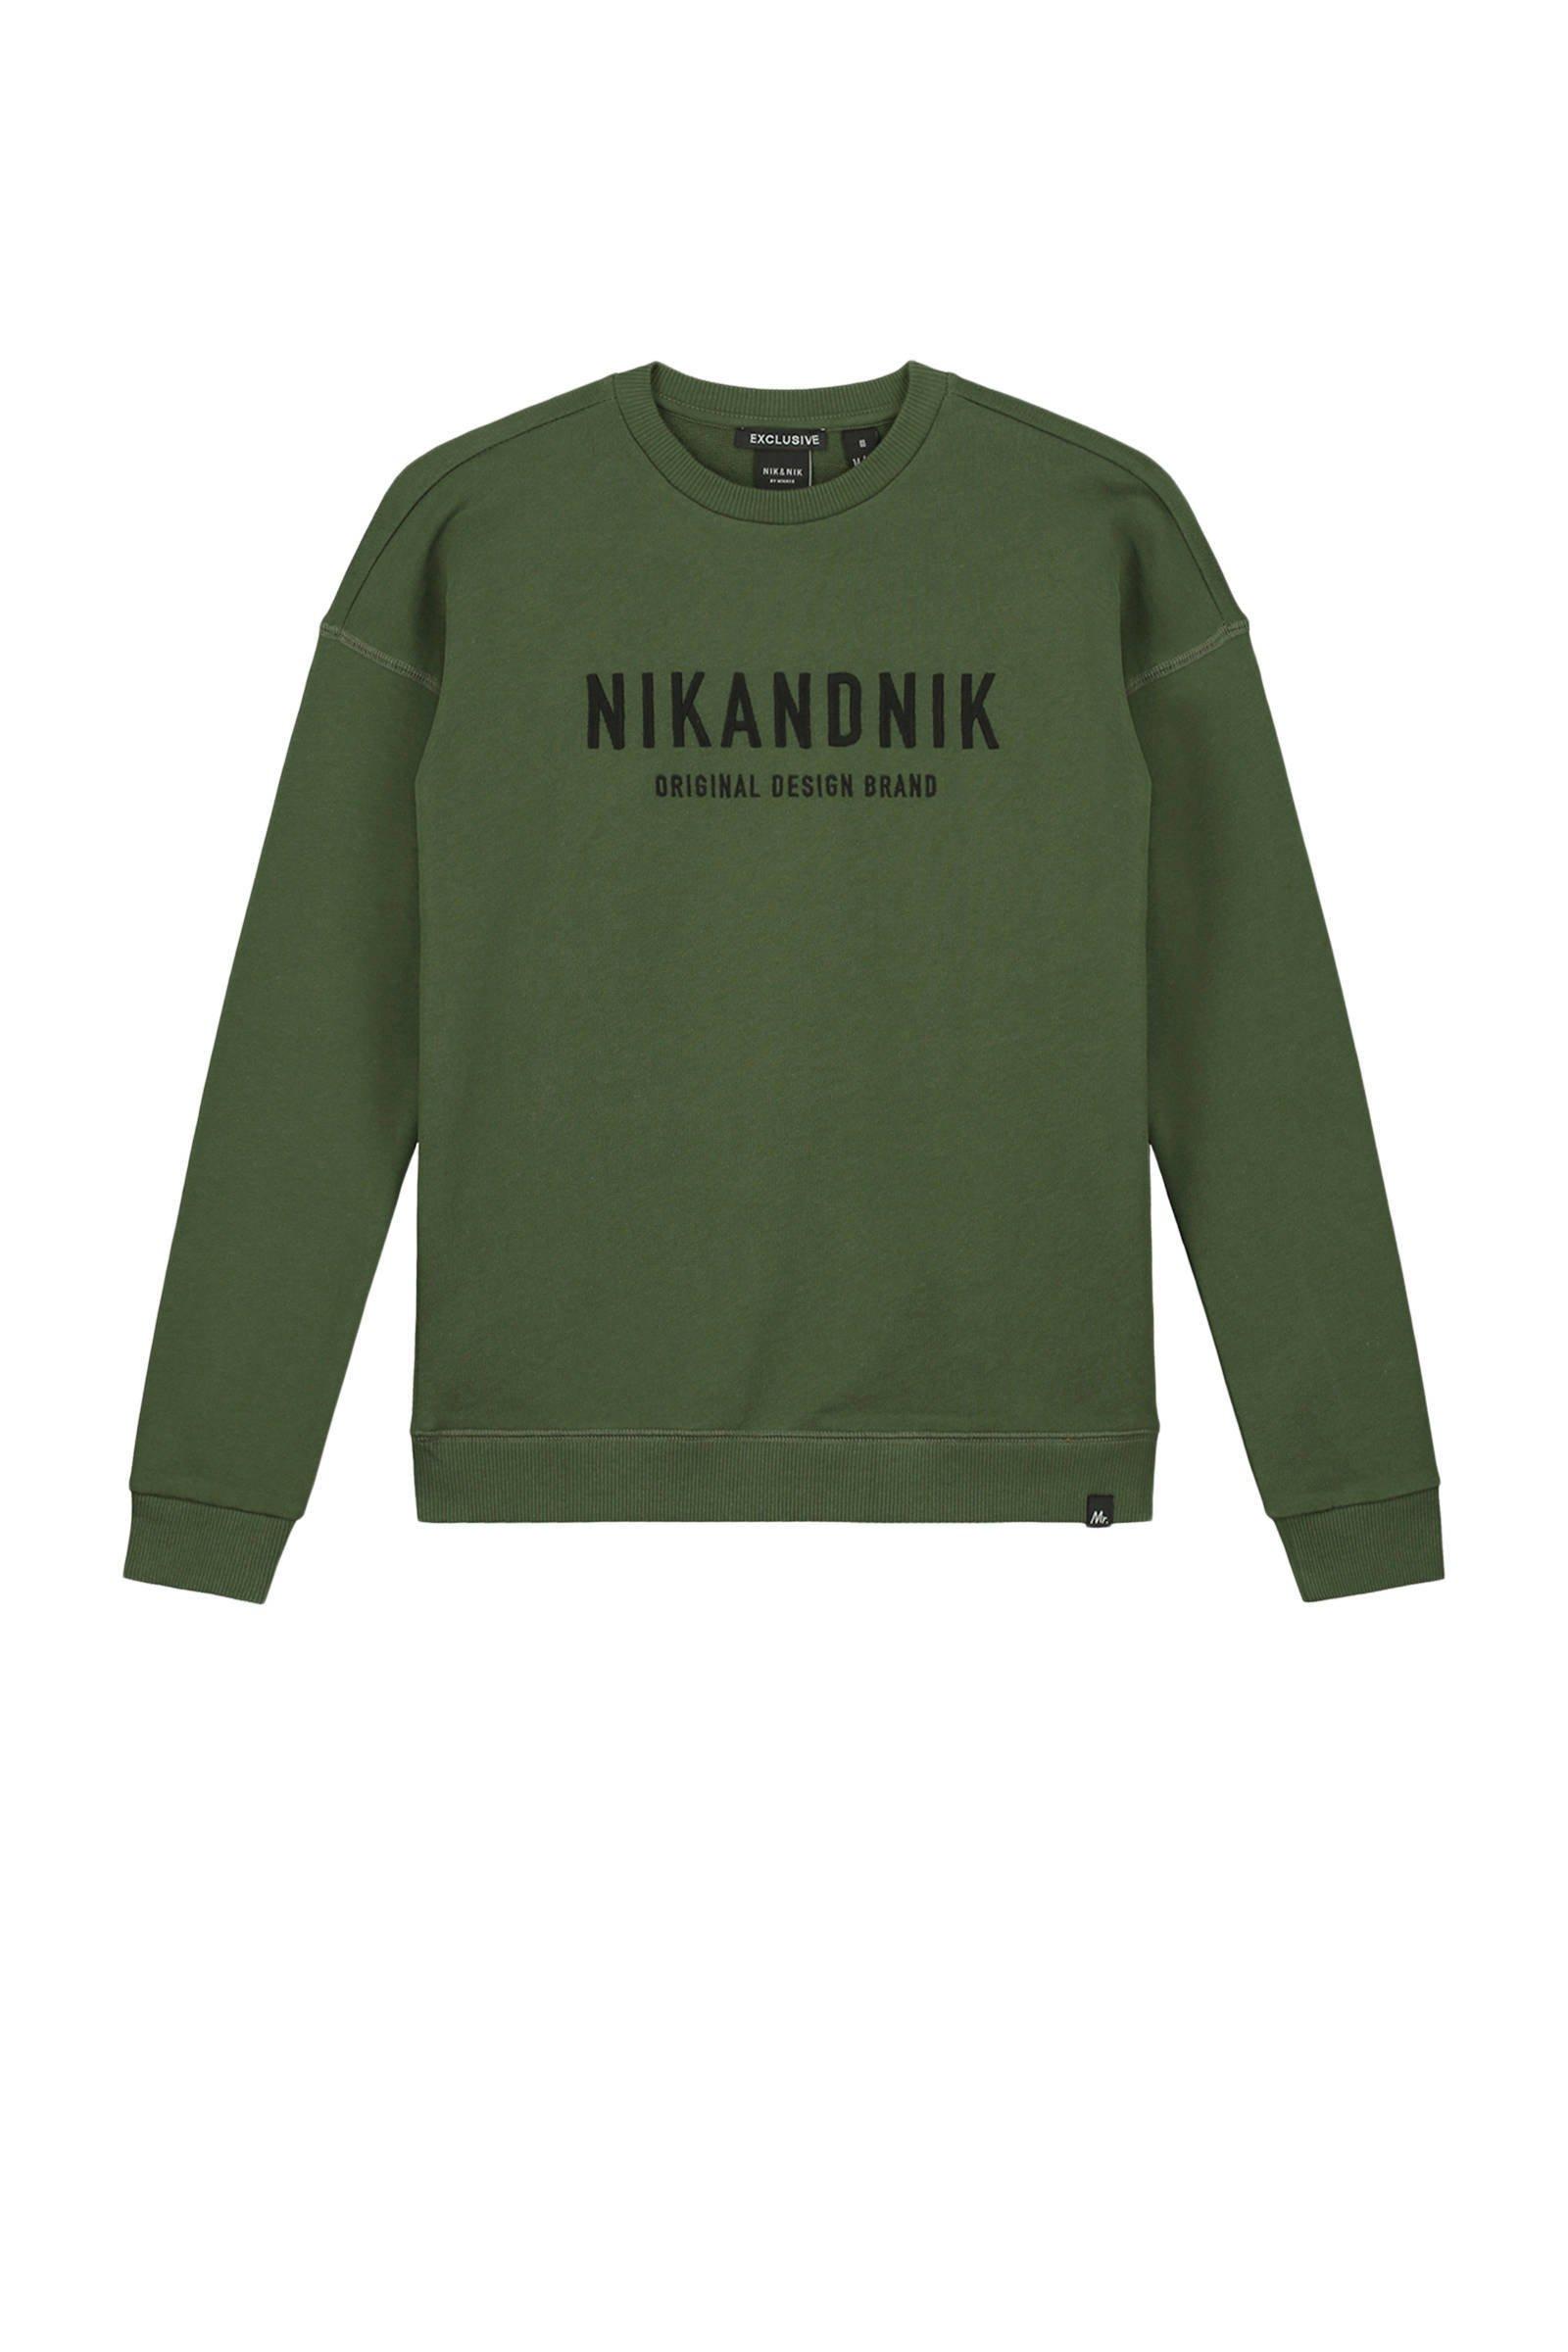 NIK&NIK sweater Milo met logo mosgroen - maat 128